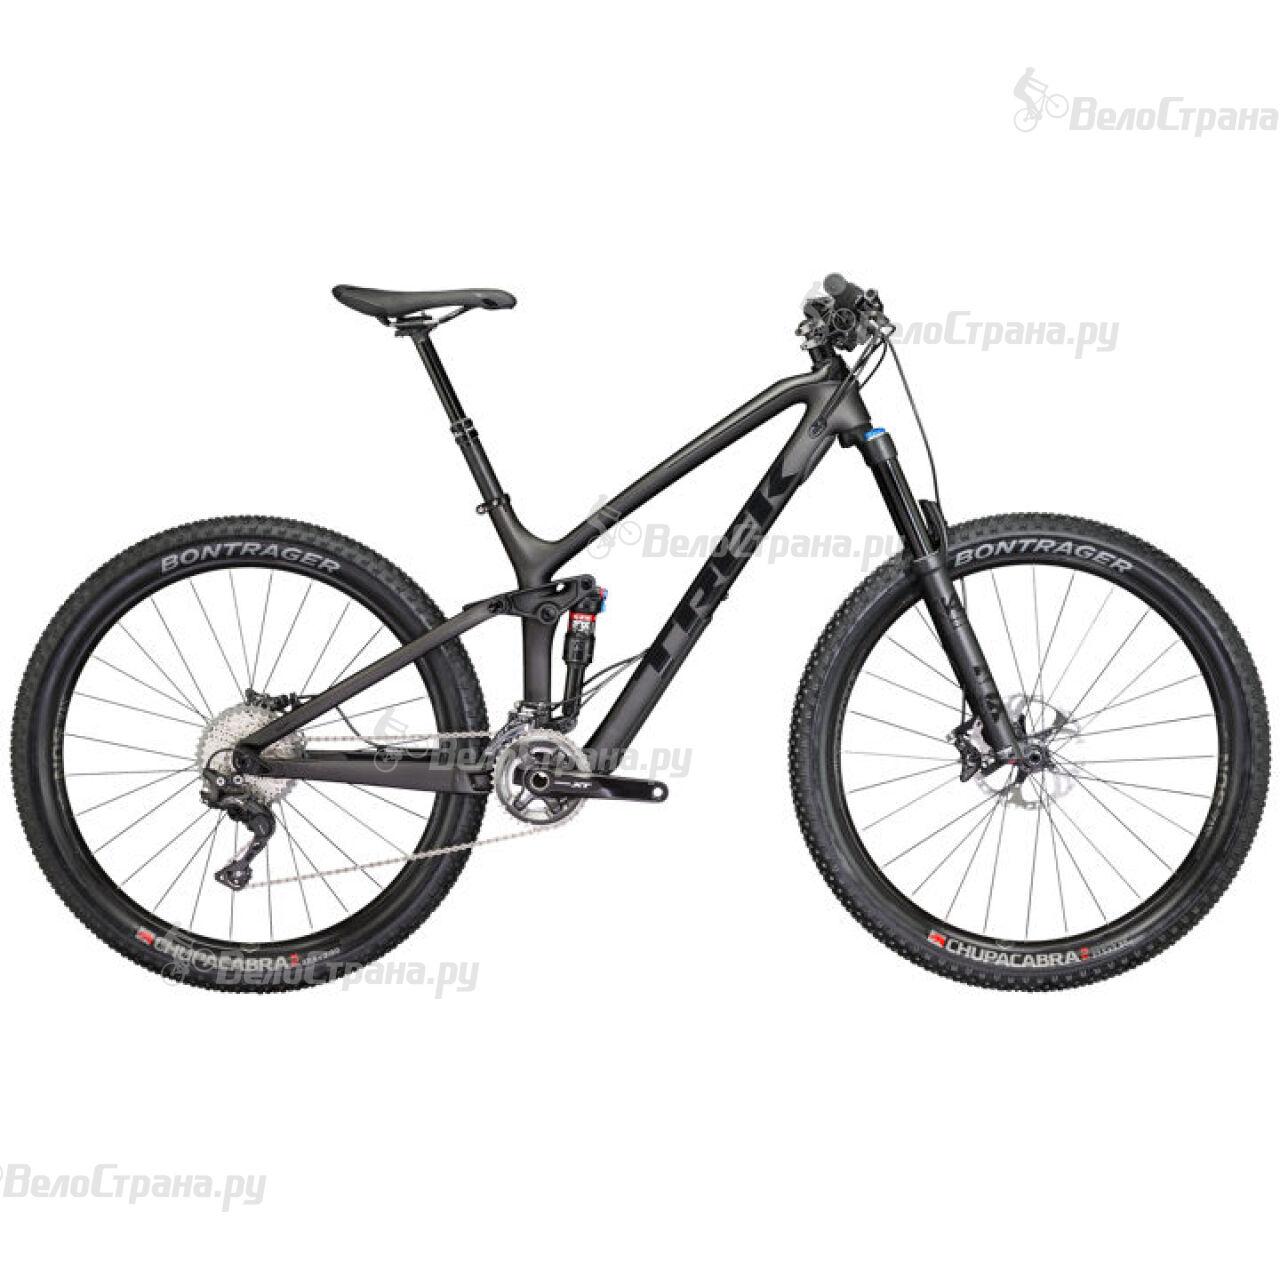 Велосипед Trek Fuel EX 9.8 27.5 PLUS (2017)